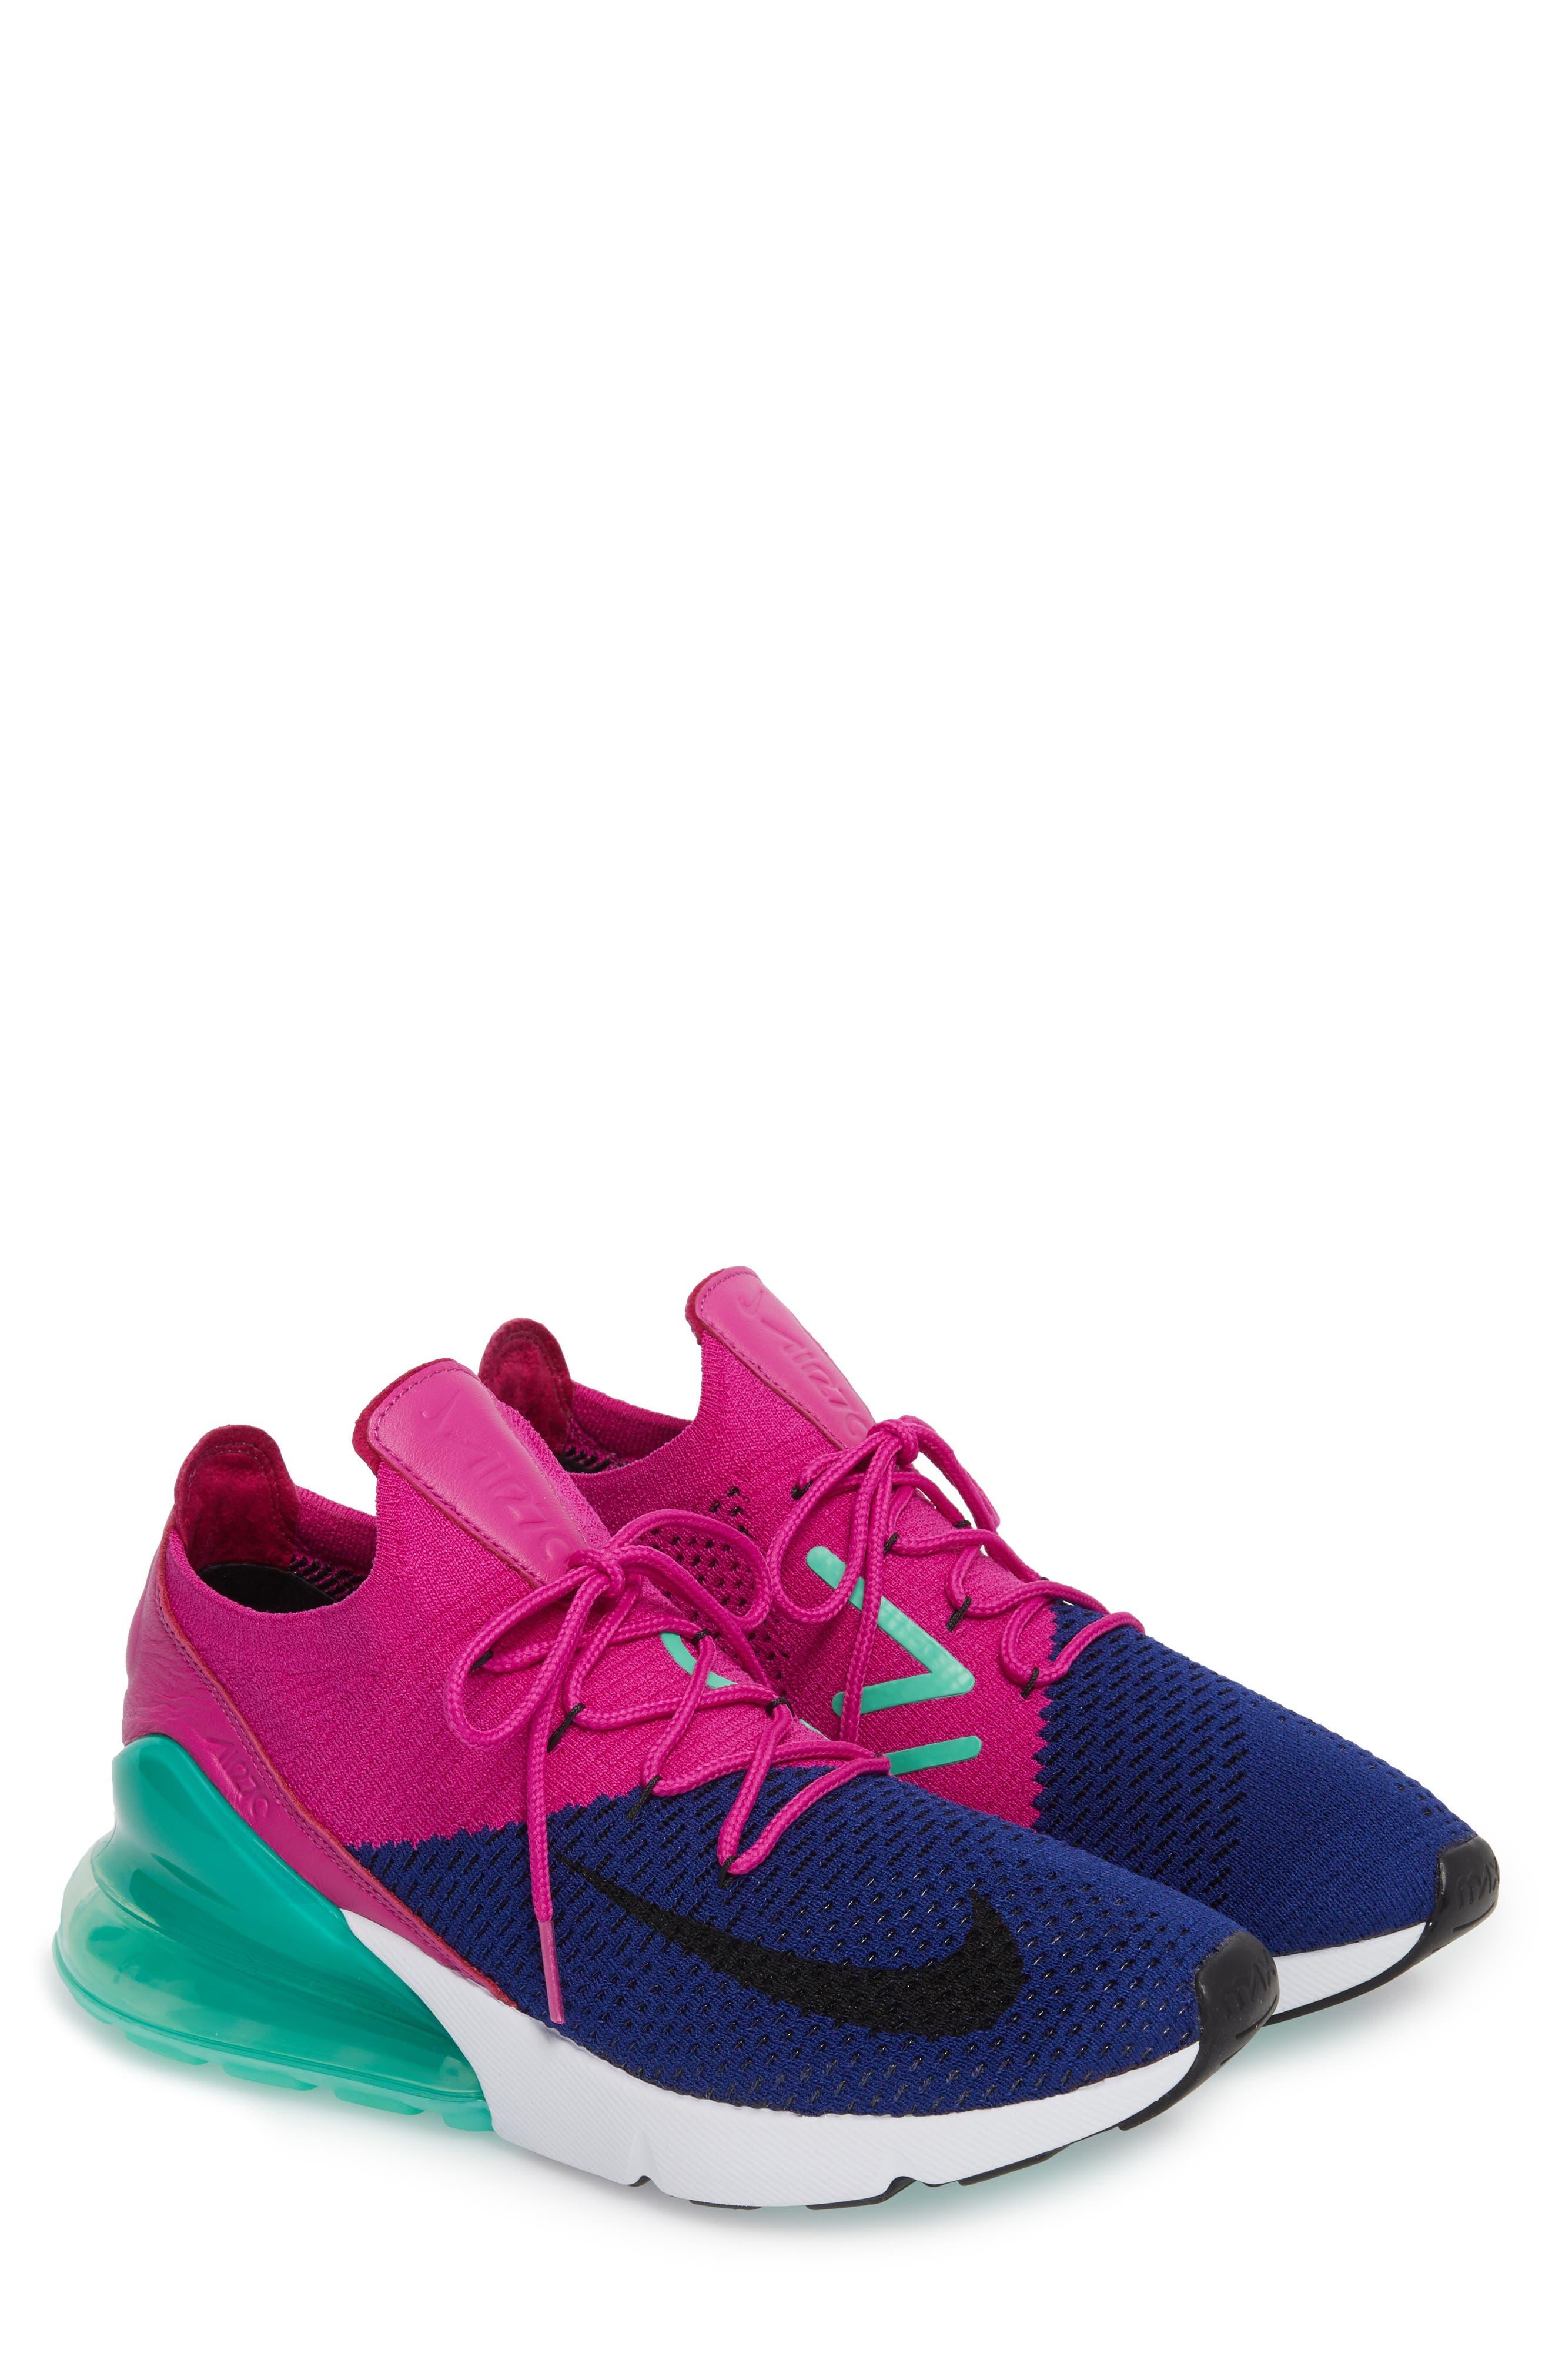 Air Max 270 Flyknit Sneaker,                             Alternate thumbnail 3, color,                             Deep Royal Blue/ Black